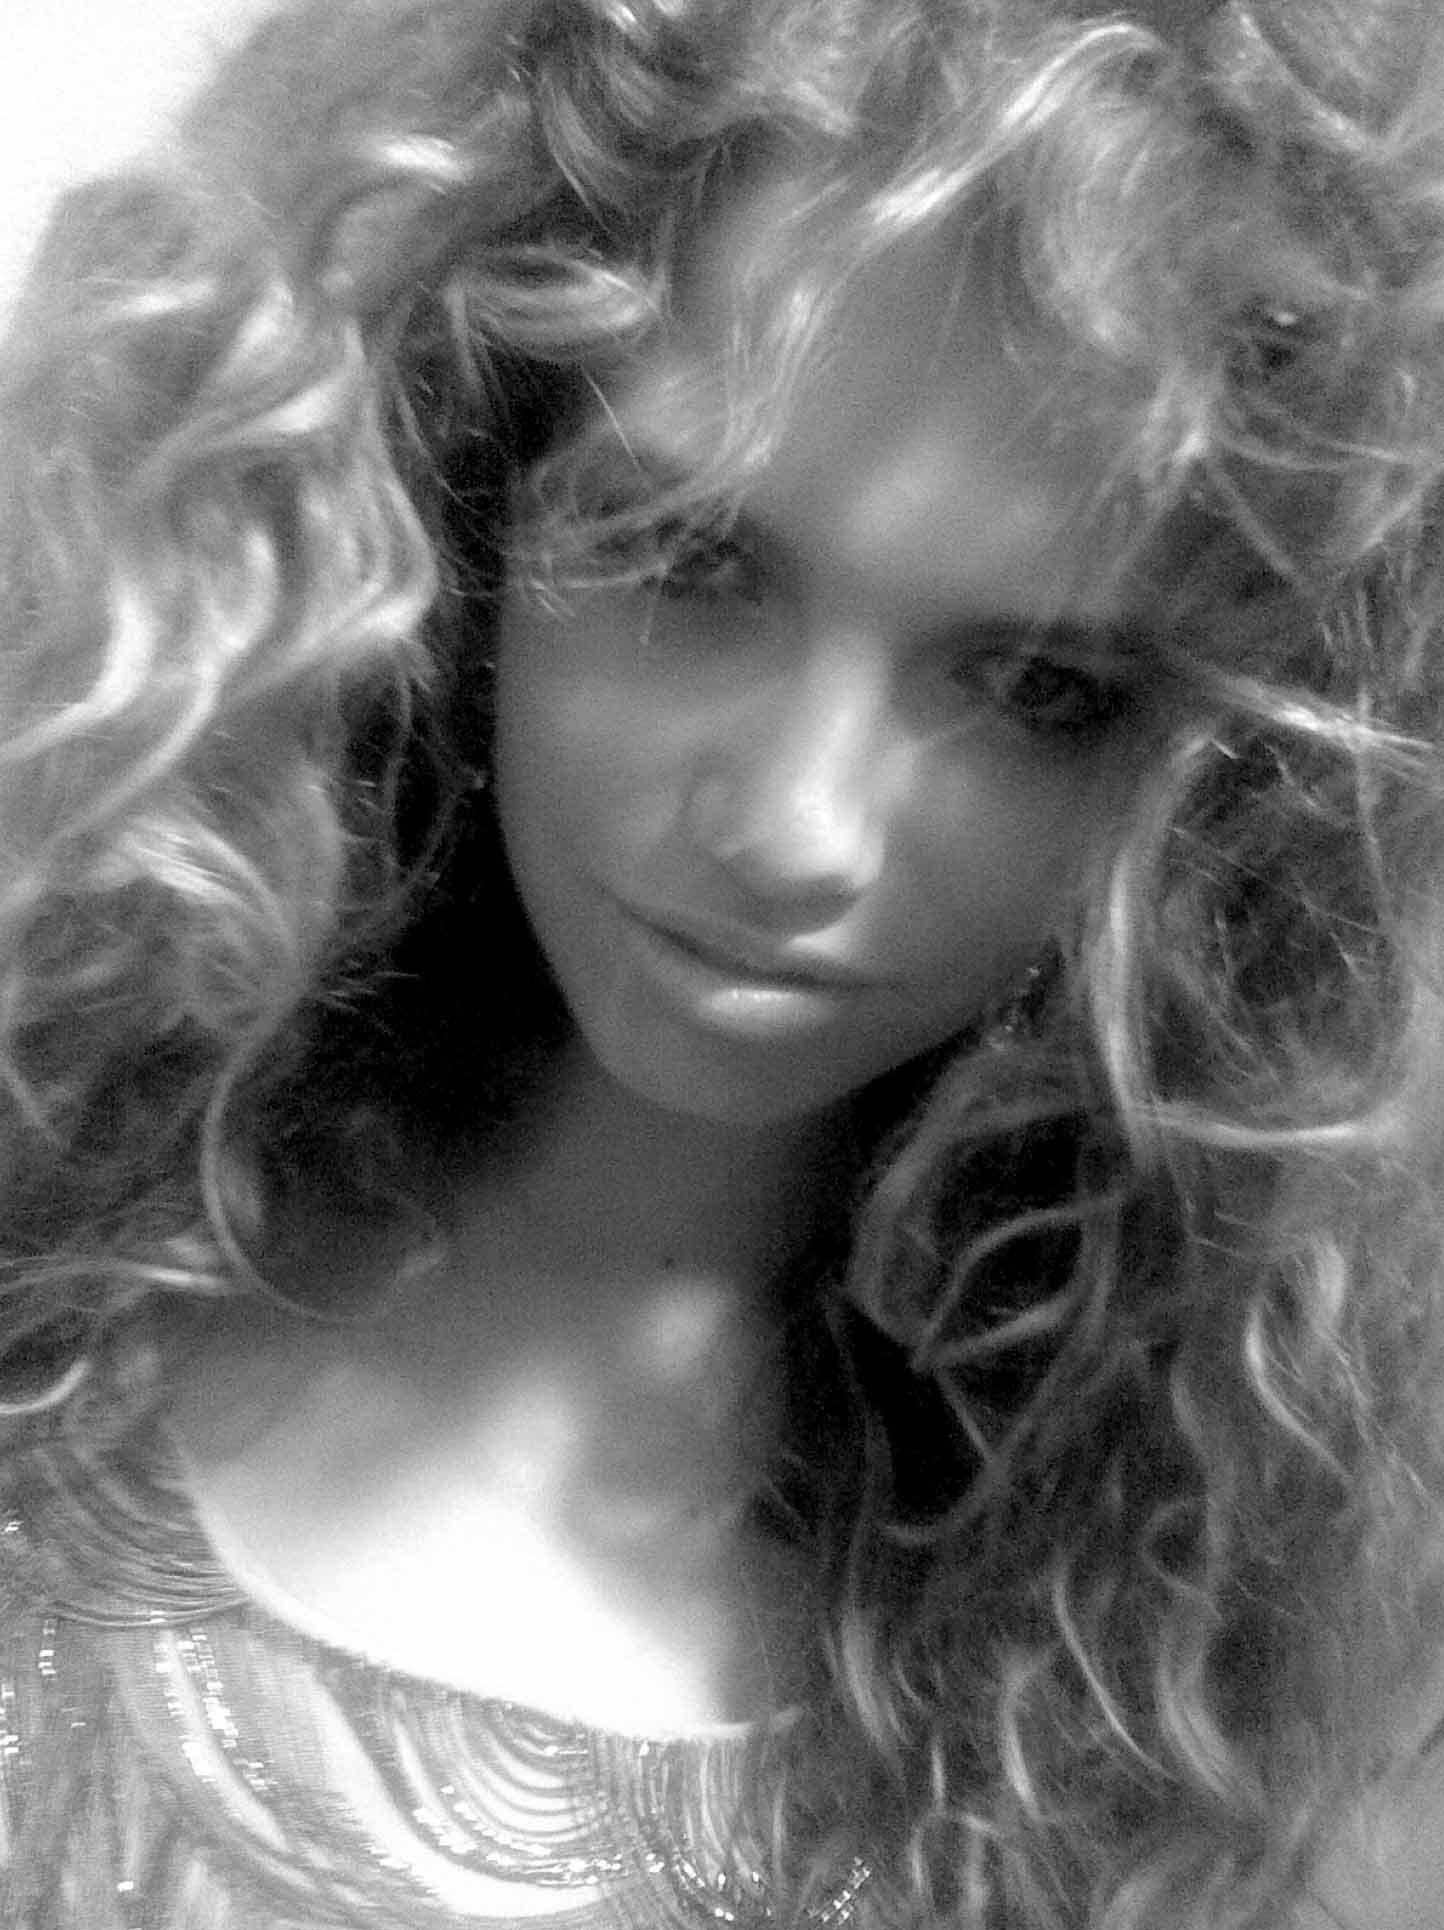 Hailey Clauson at Genlux shoot on January 28, 2009